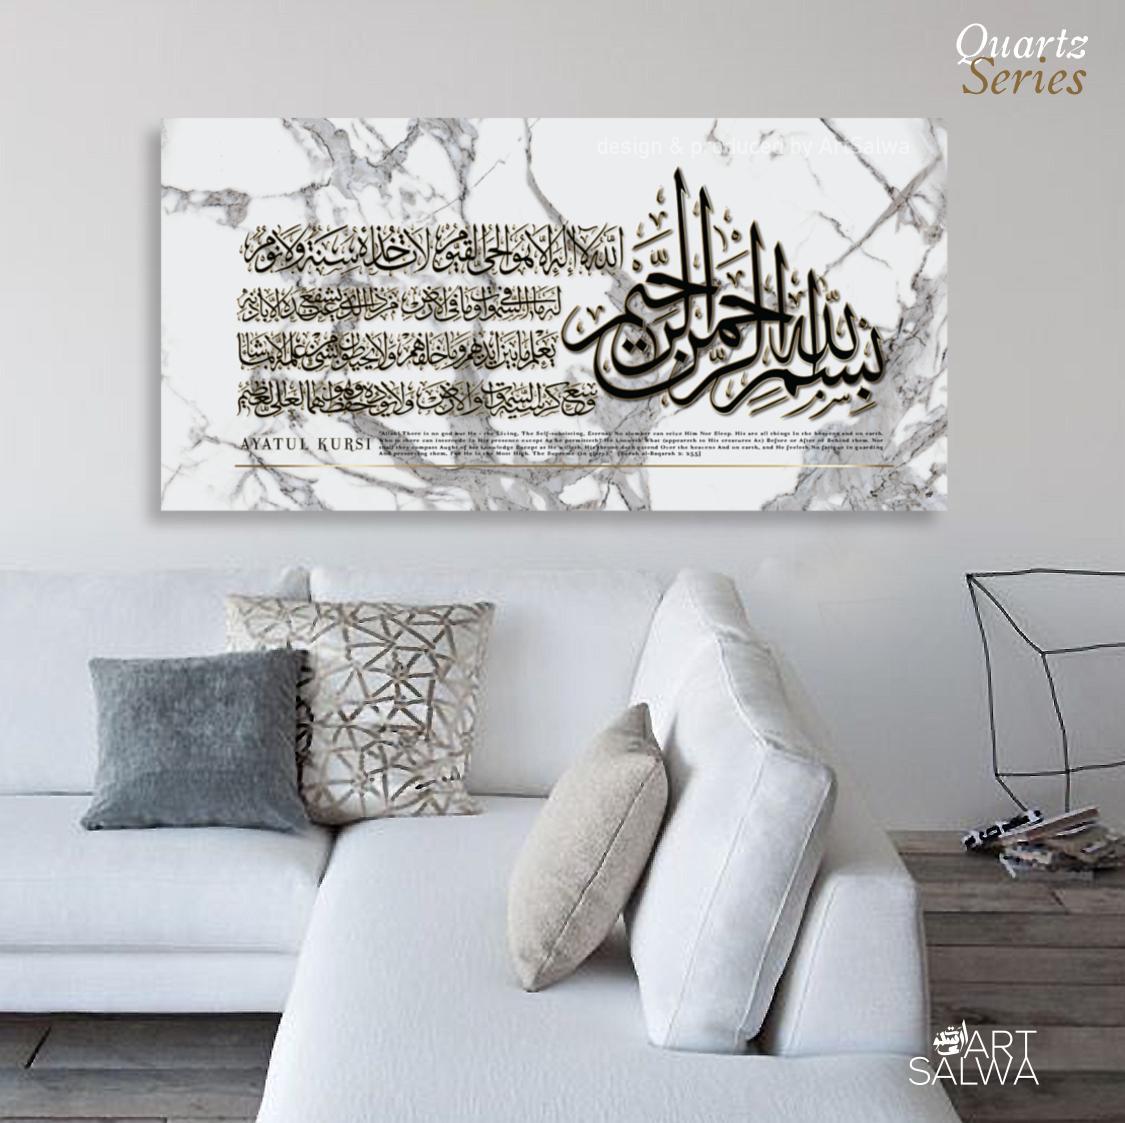 Quartz Design | Al Kursi Islamic Frame |  Alkursi stretched | Islam Ayat Frame | Islamic Artwork